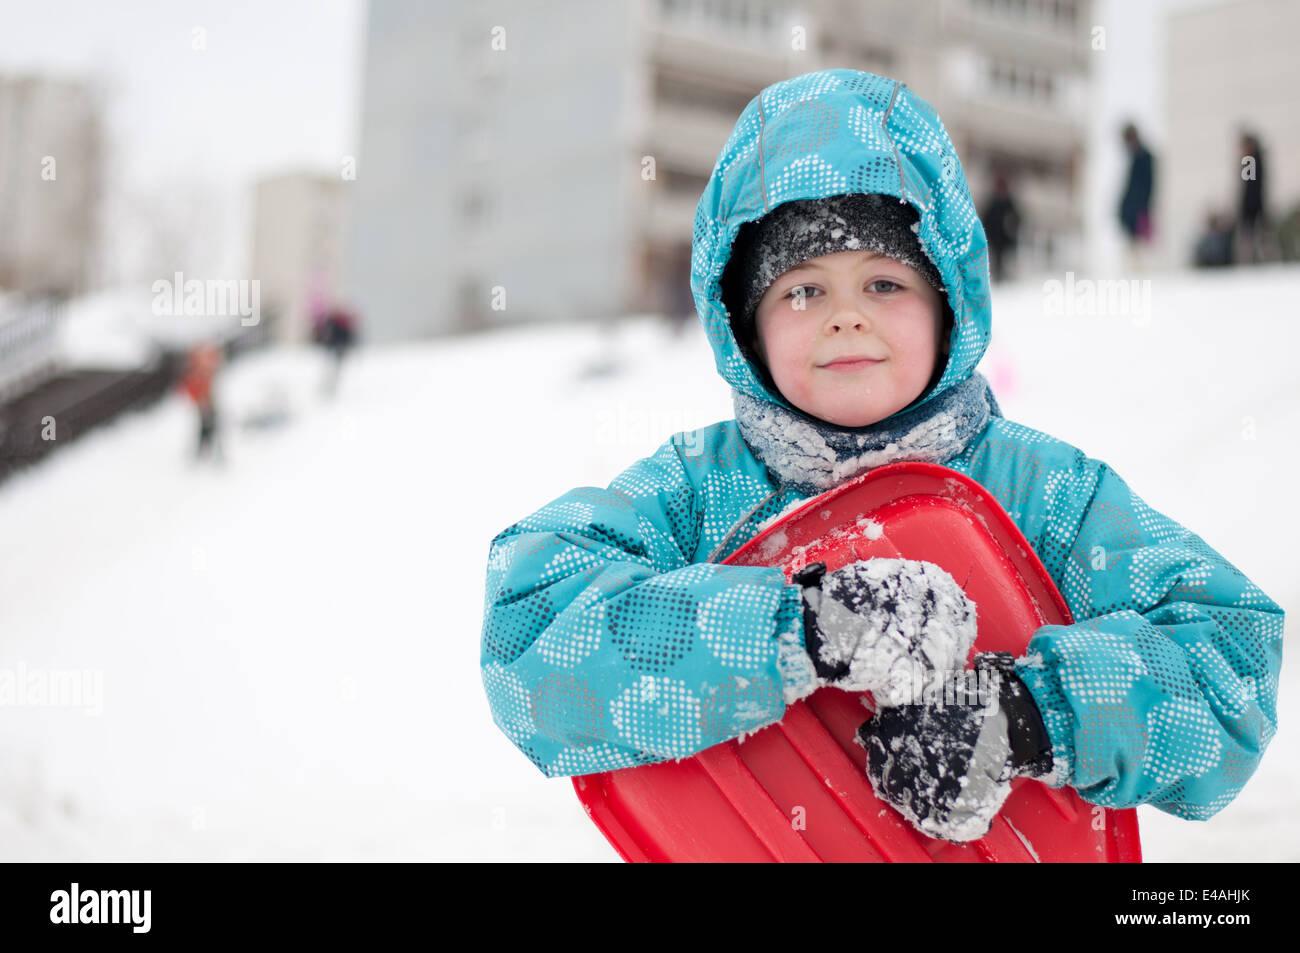 child winter kid sled snow activity cheerful